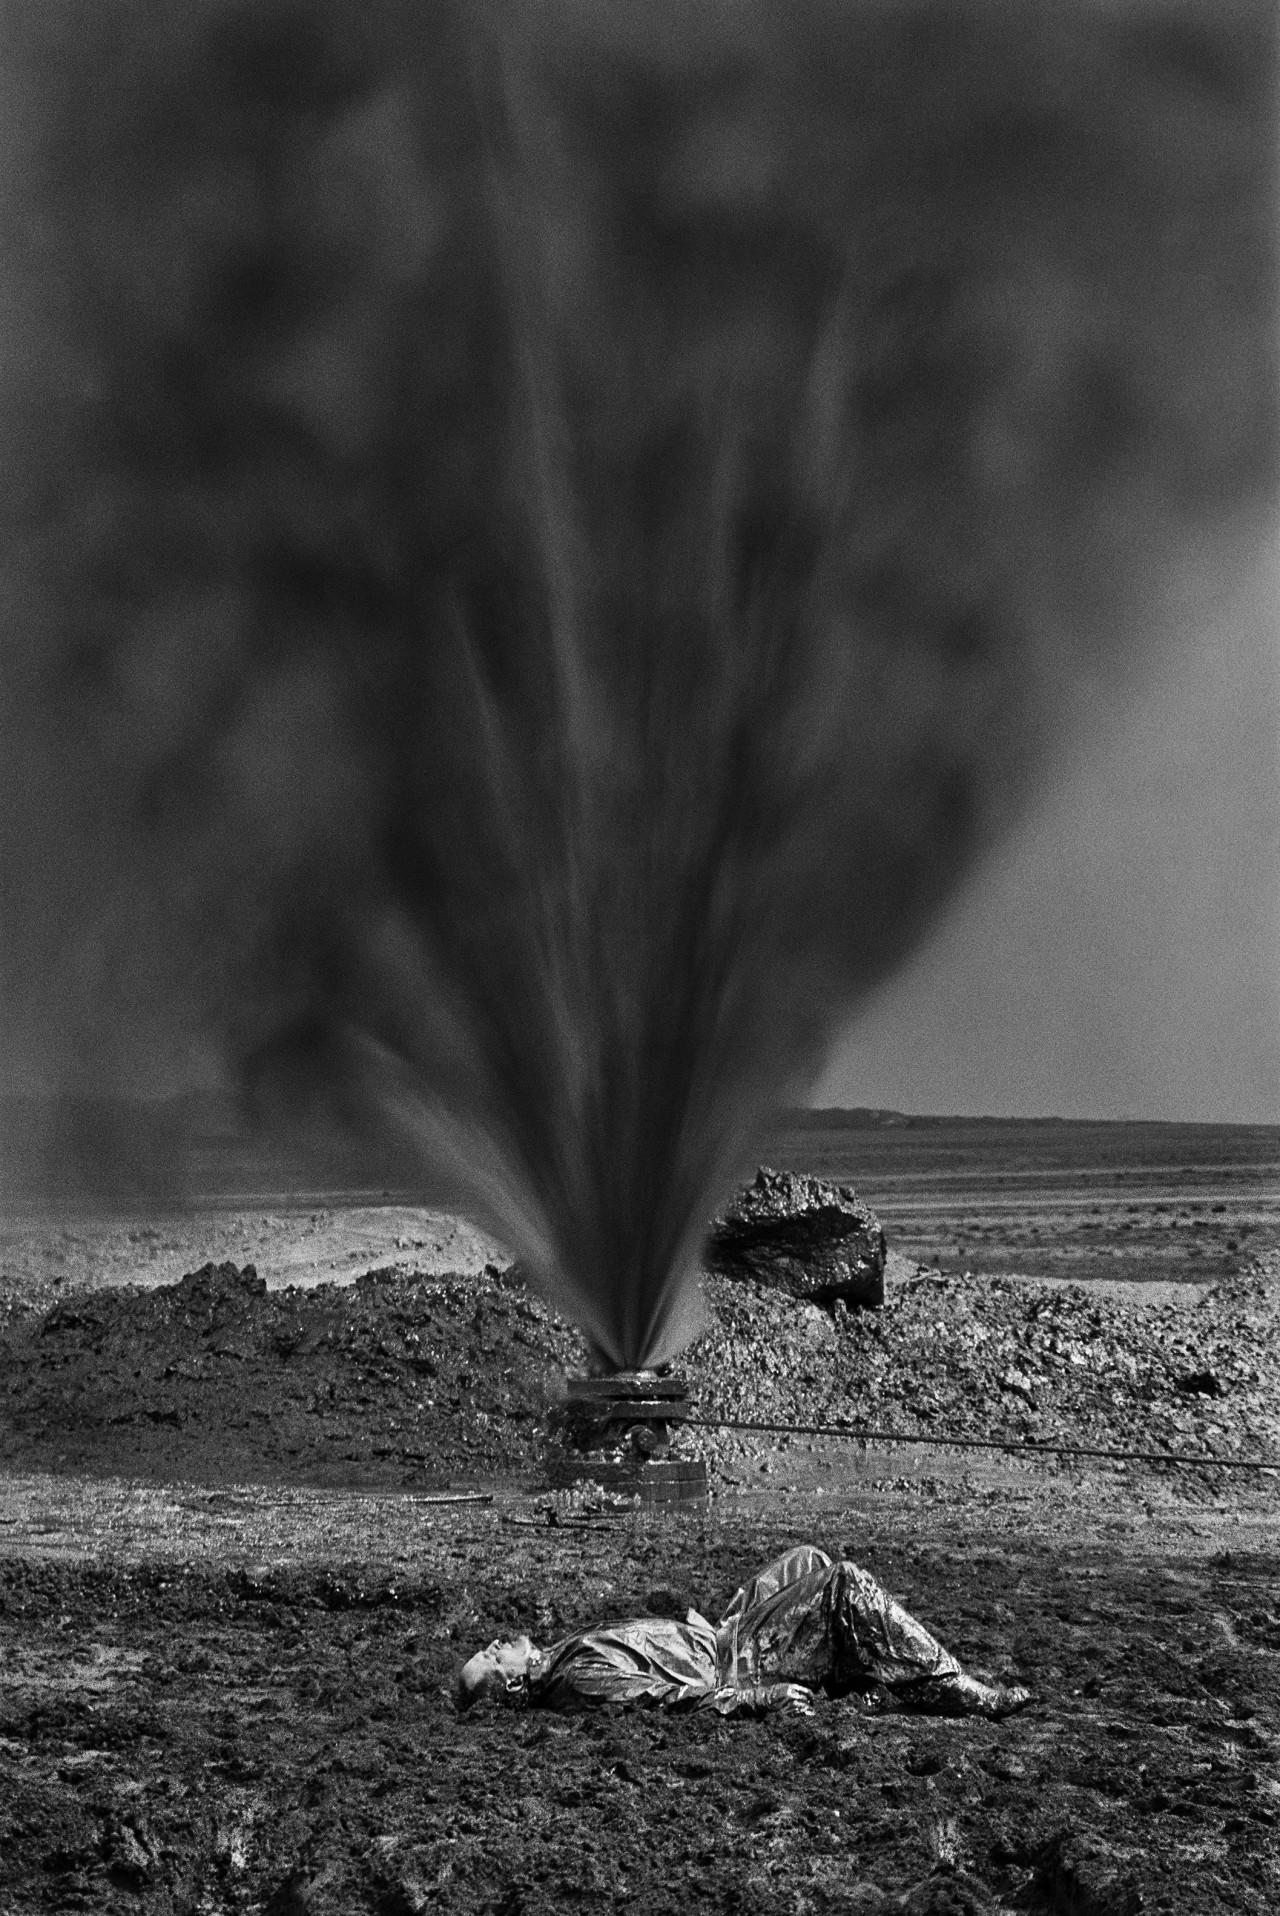 Кувейт, 1991. Автор Себастьян Сальгадо